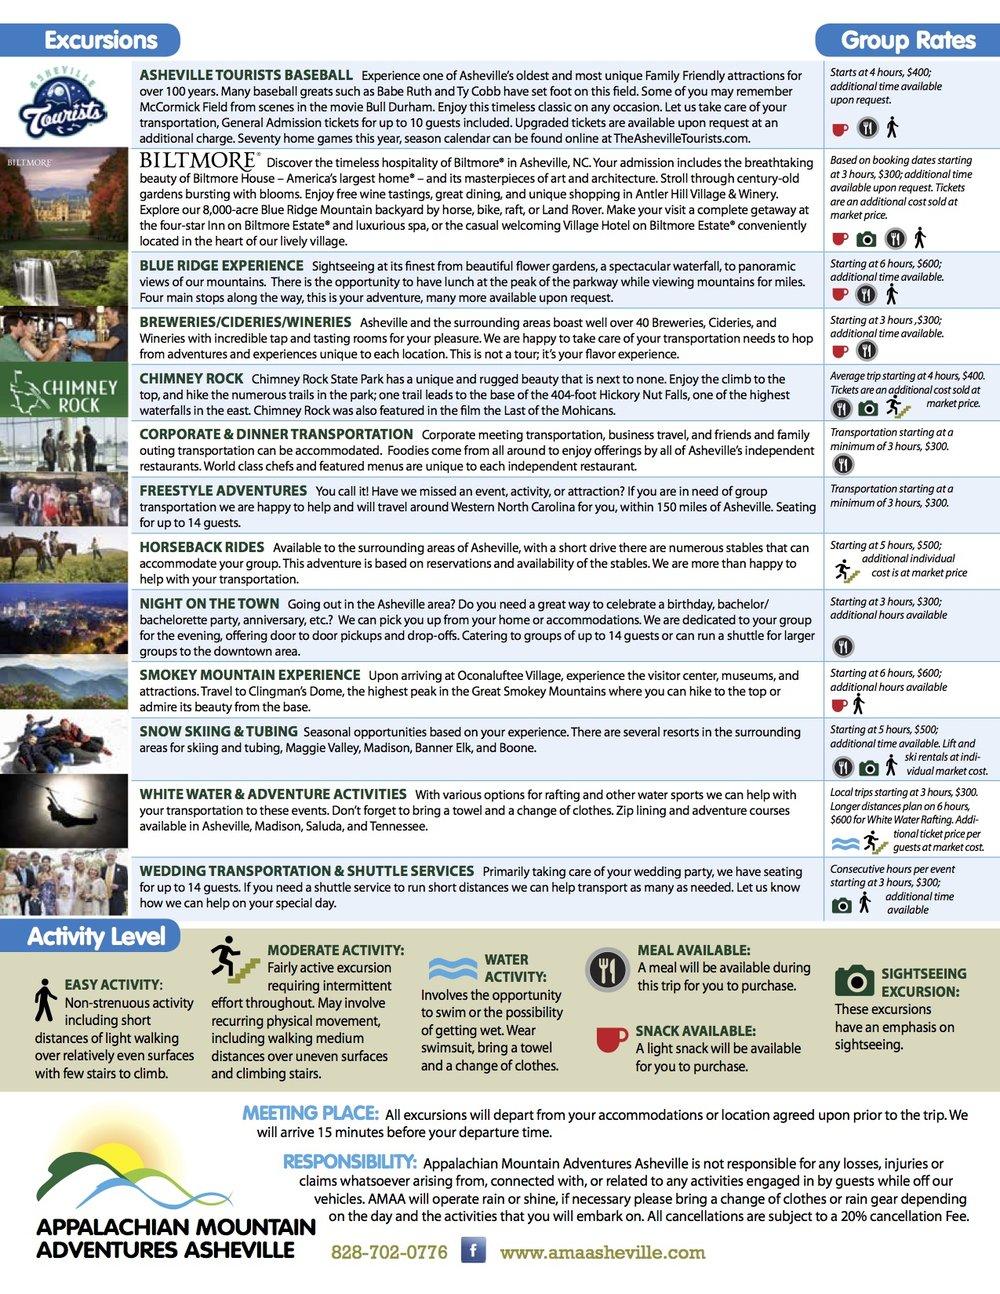 Adventures-Asheville-Transportation-Service-Engaged-Asheville-6-page-2.jpg